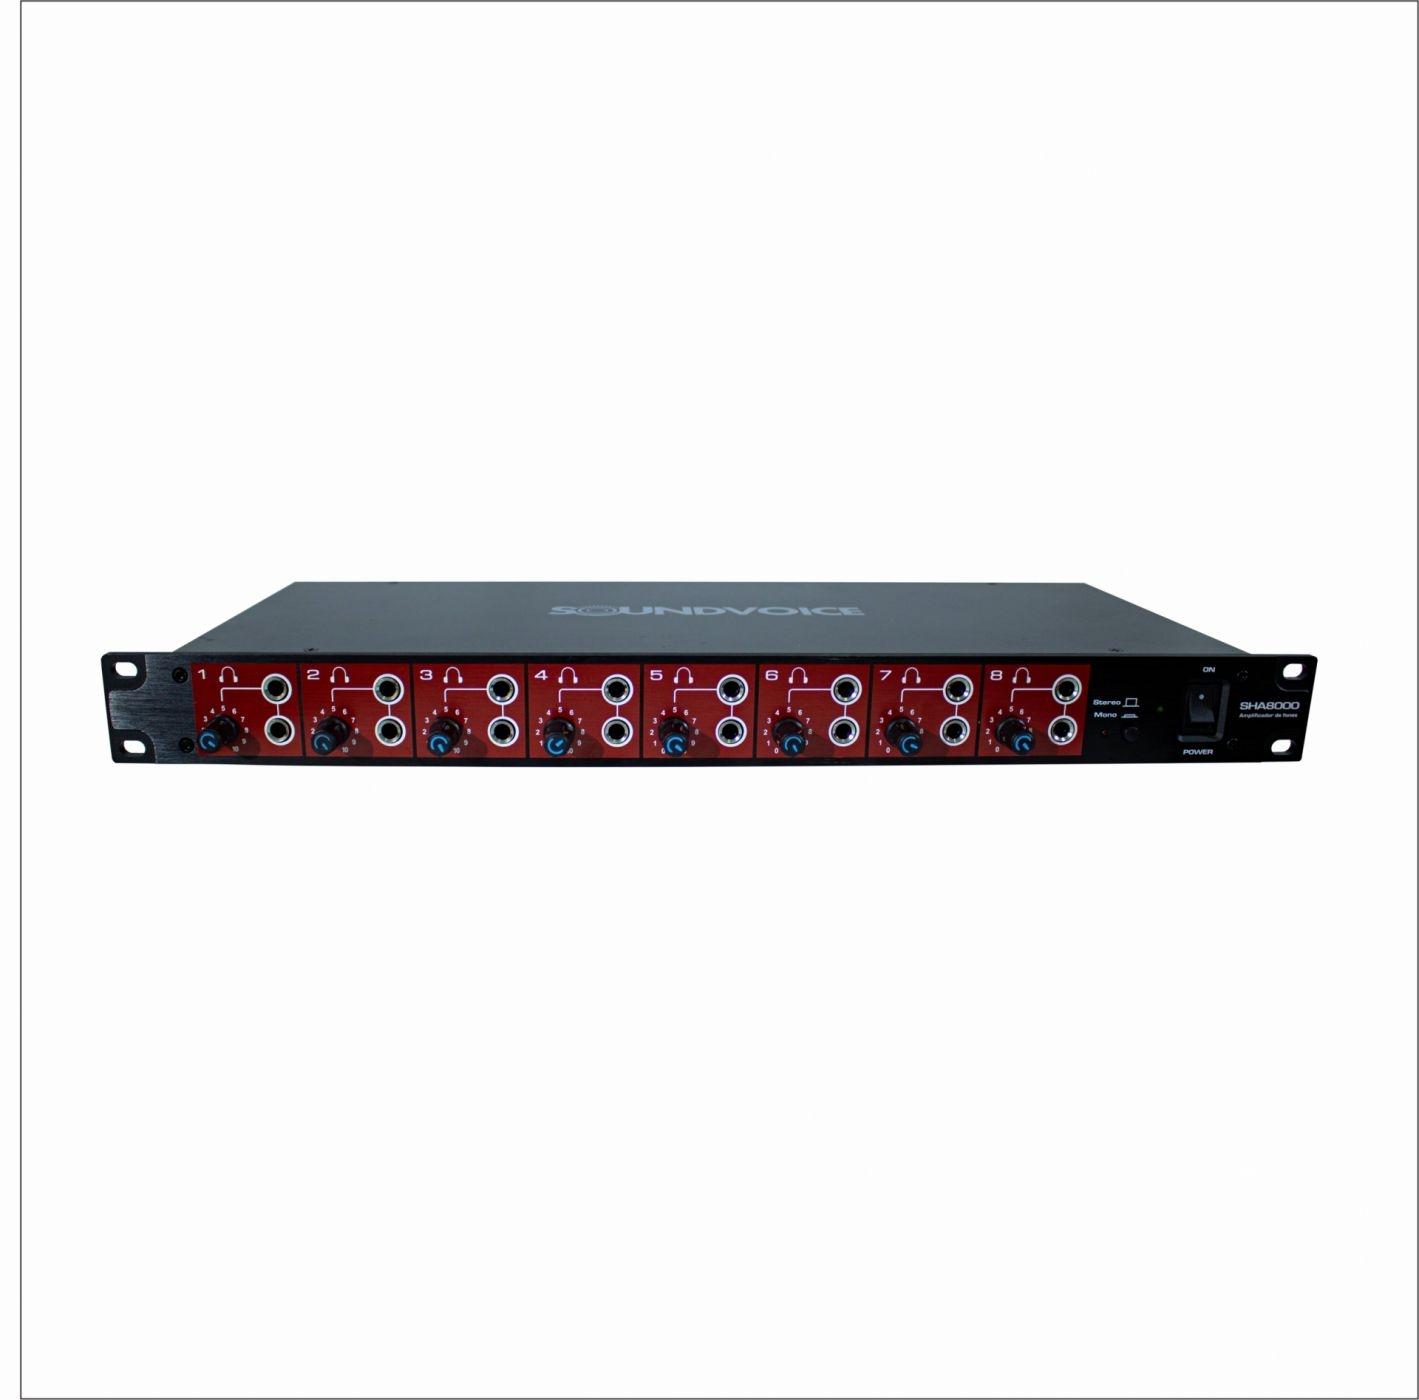 Amplificador de Fones de Ouvido Soundvoice SHA8000